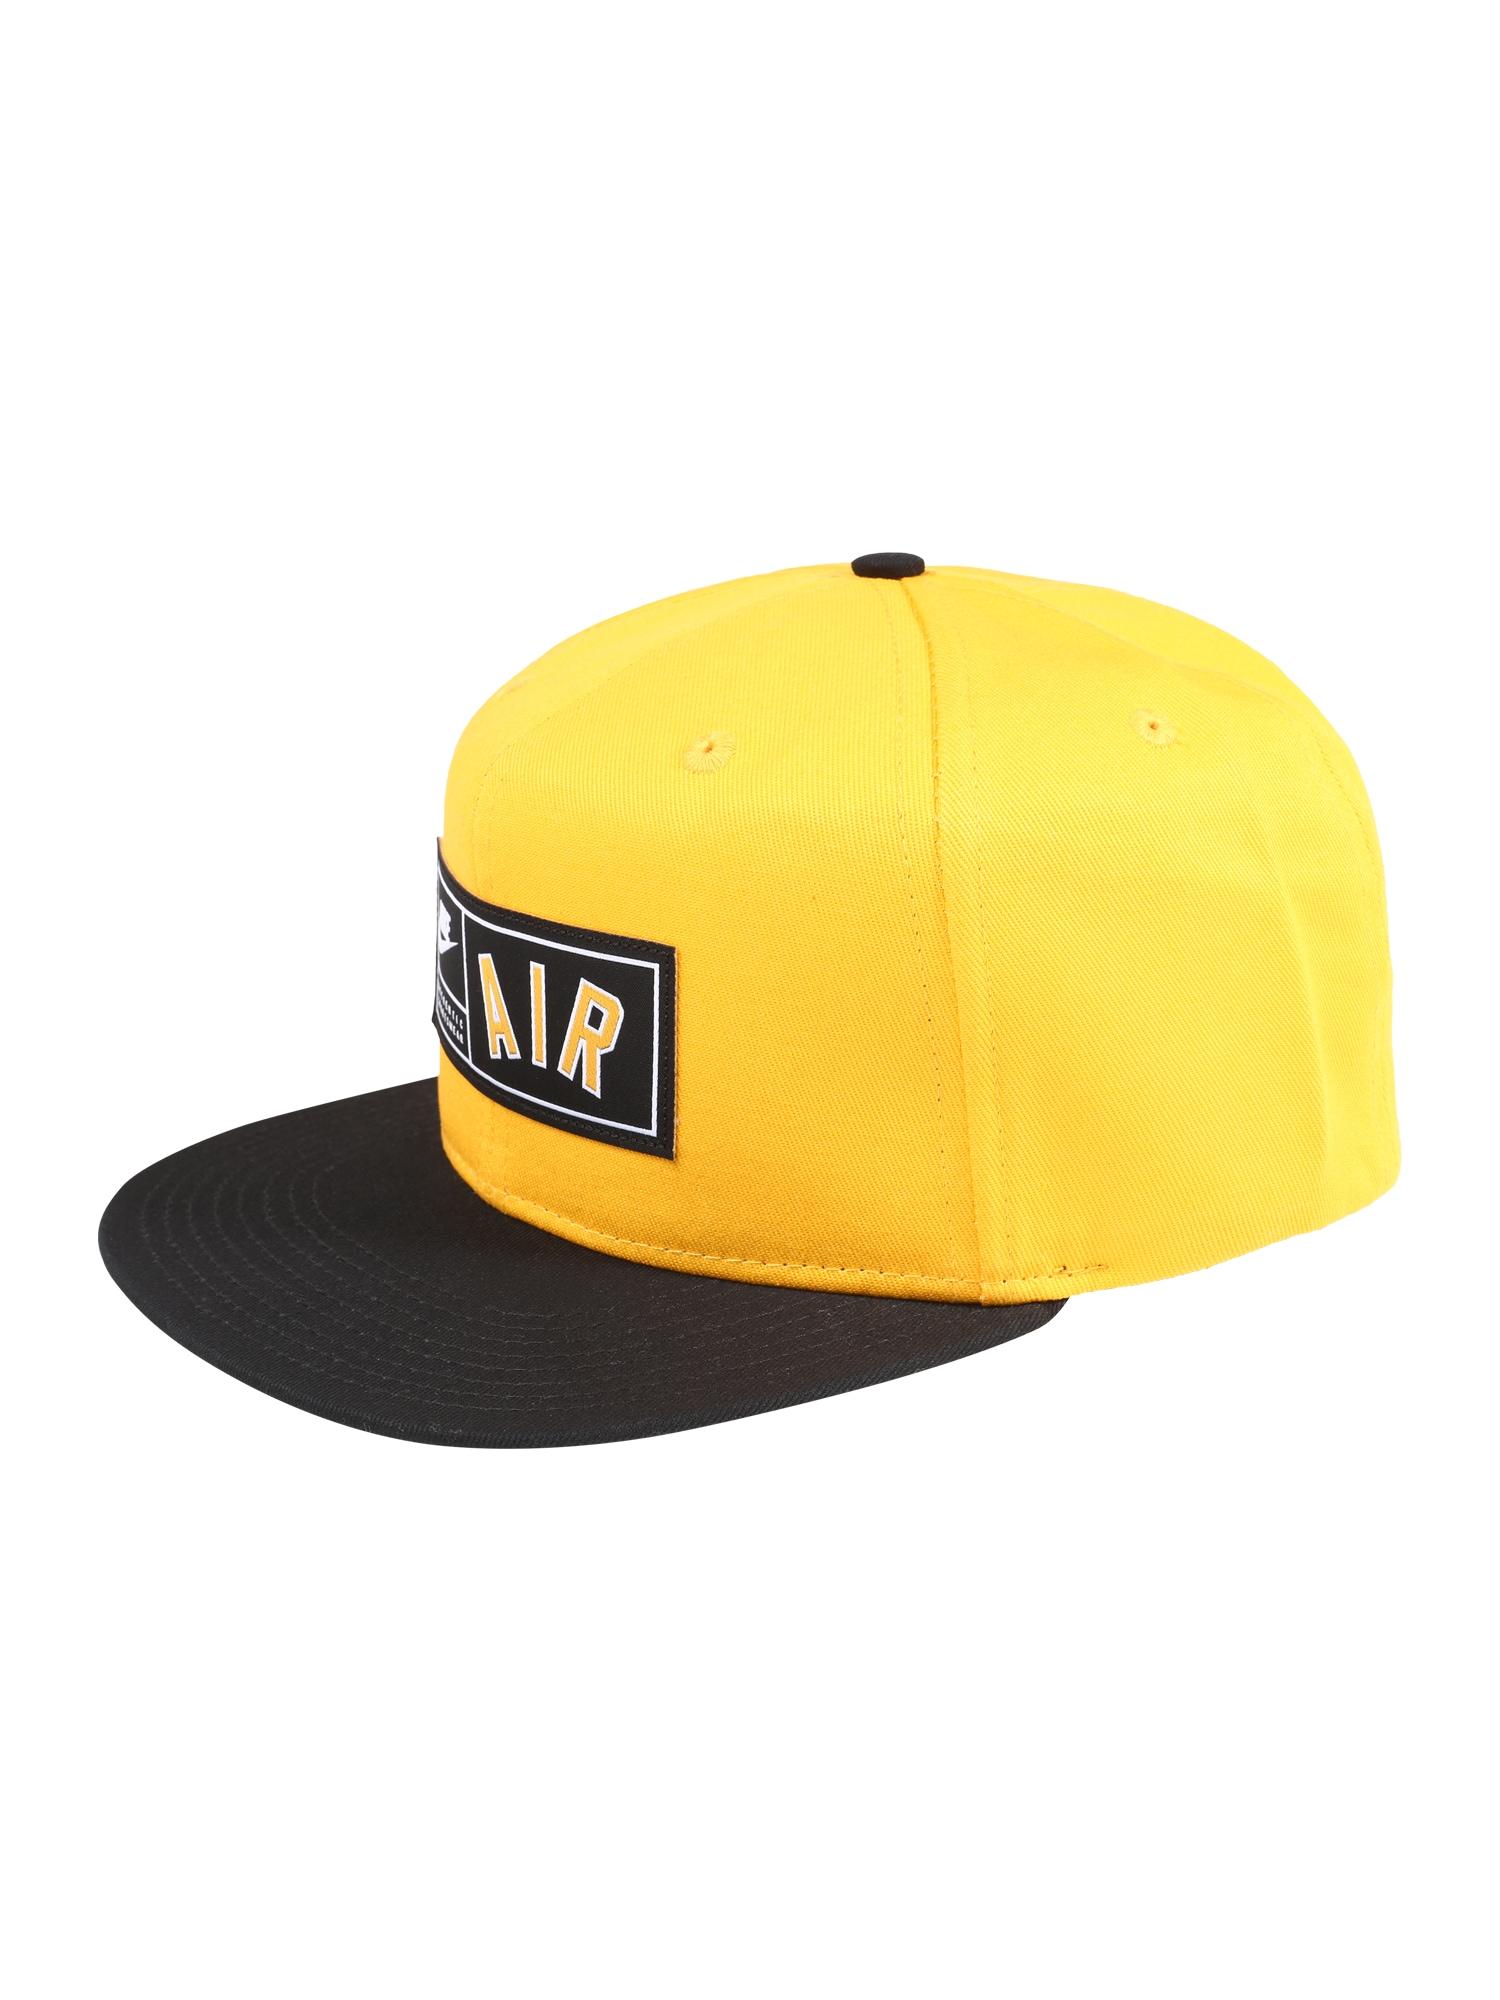 Kšiltovka Nike Air Pro zlatá černá Nike Sportswear